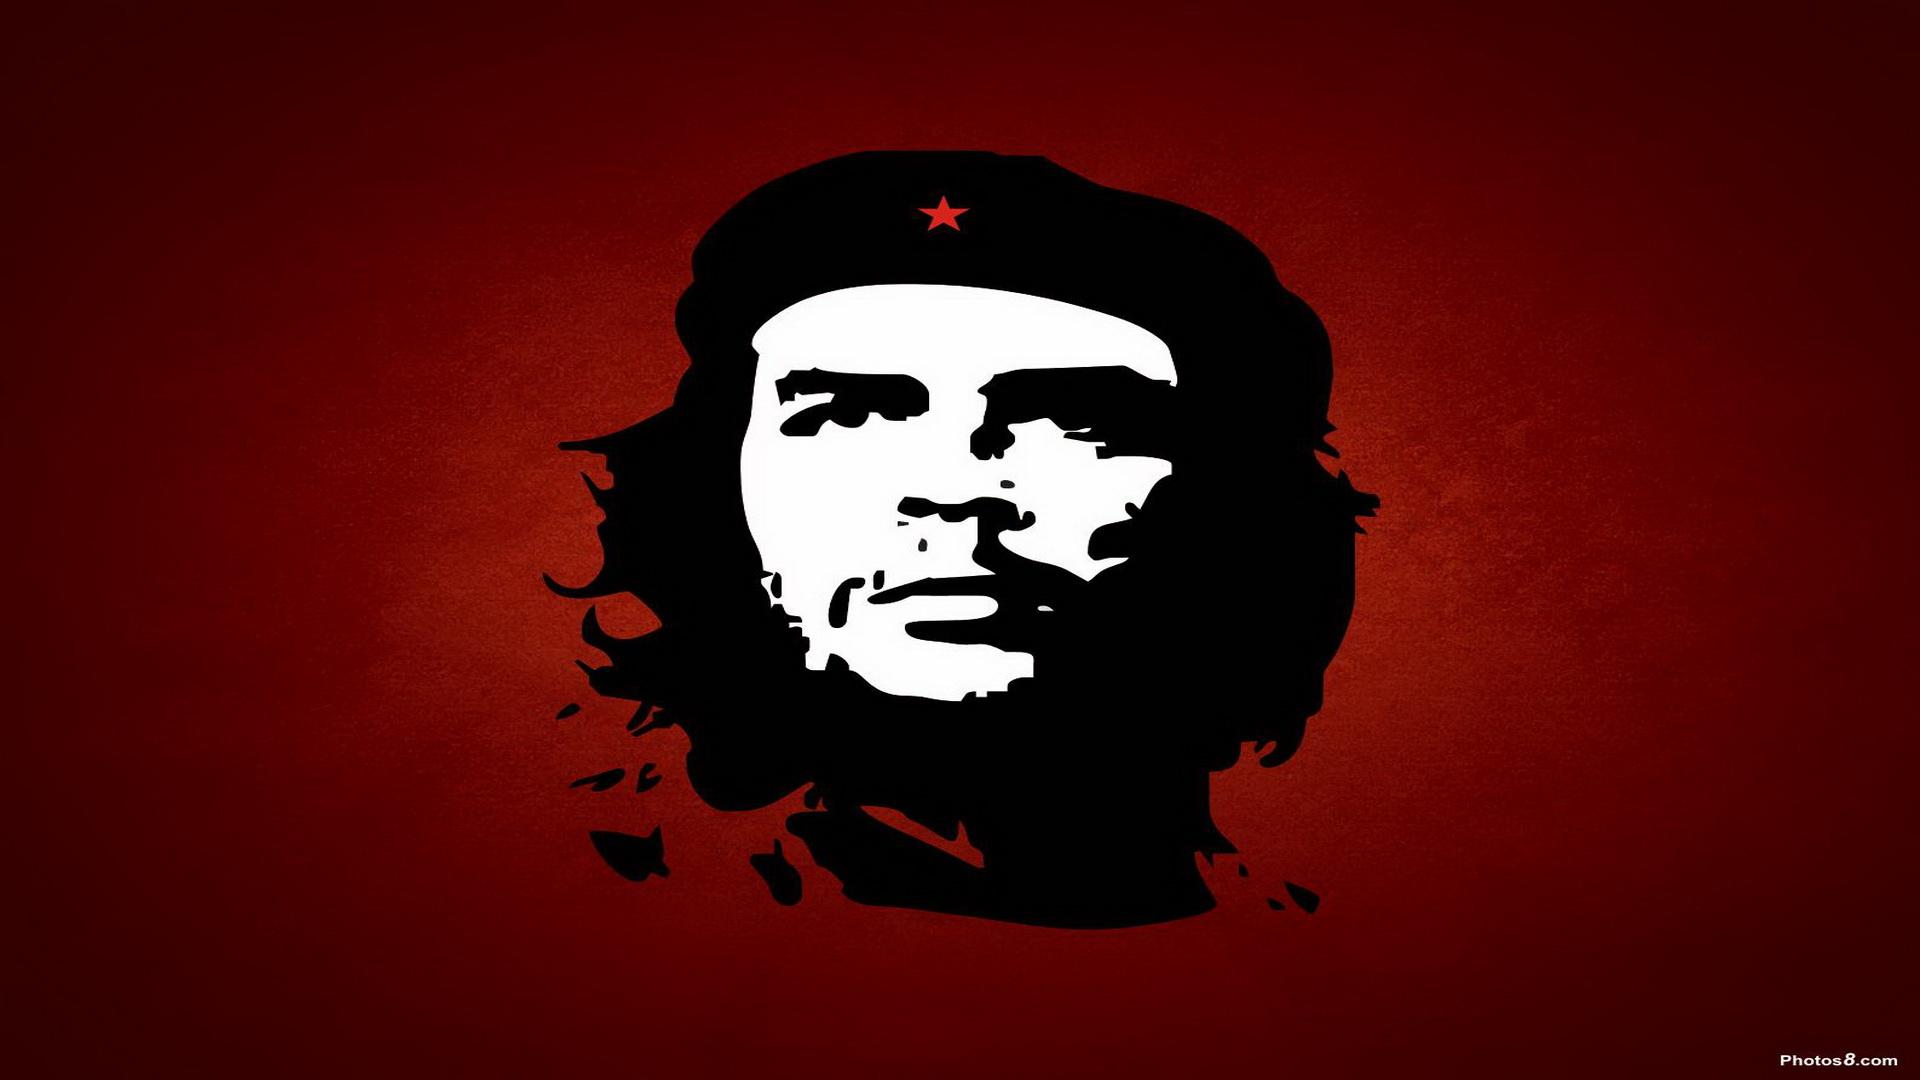 Che Guevara Wallpapers 10 HD Desktop Wallpapers 1920x1080